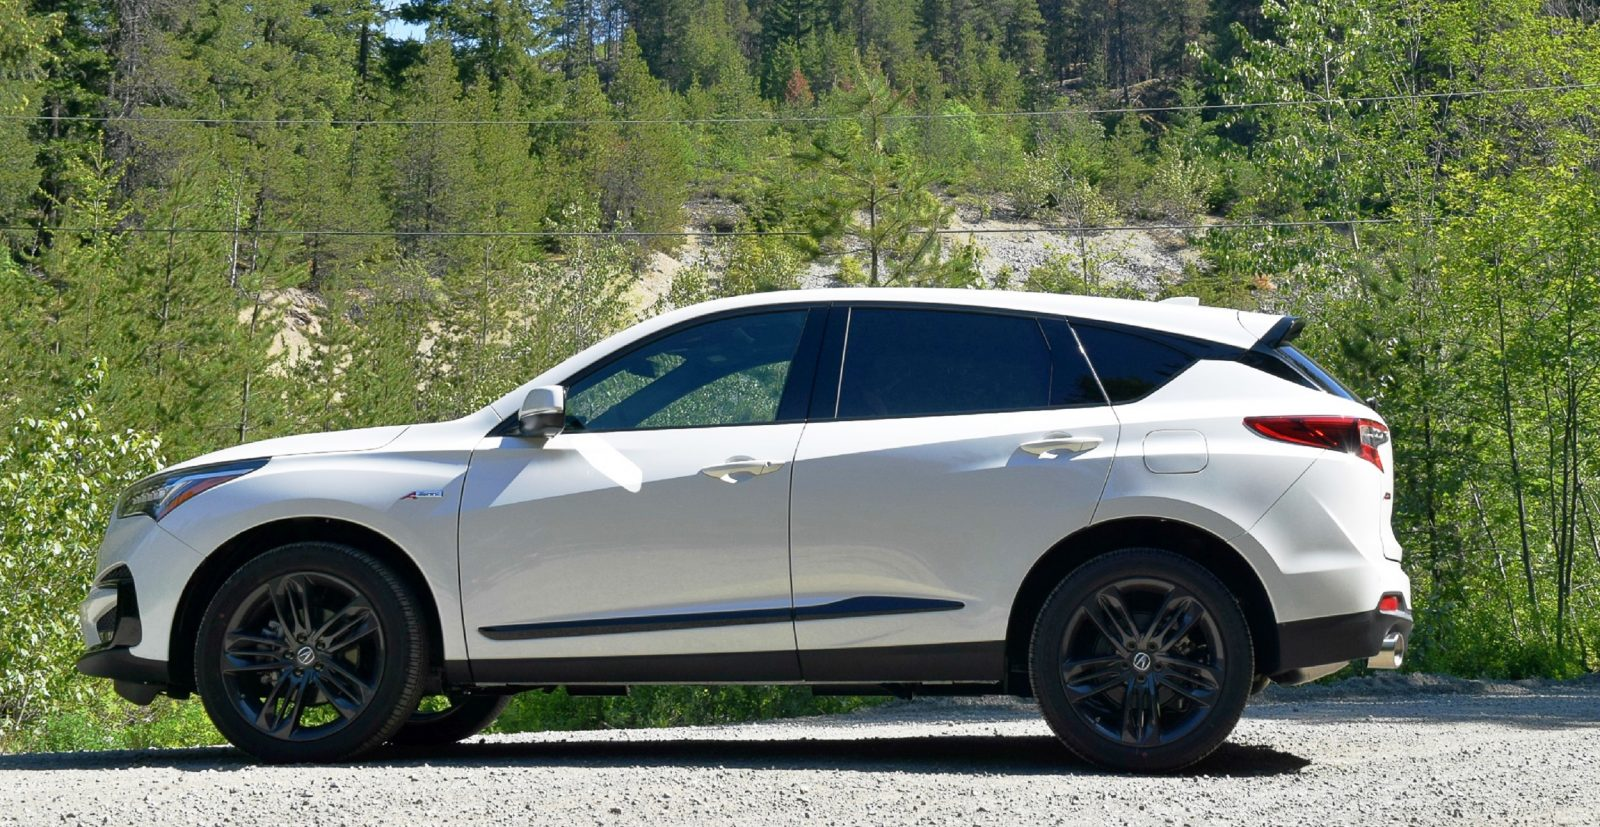 2016 Acura Tl >> 2019 Acura RDX A-Spec SH-AWD 2